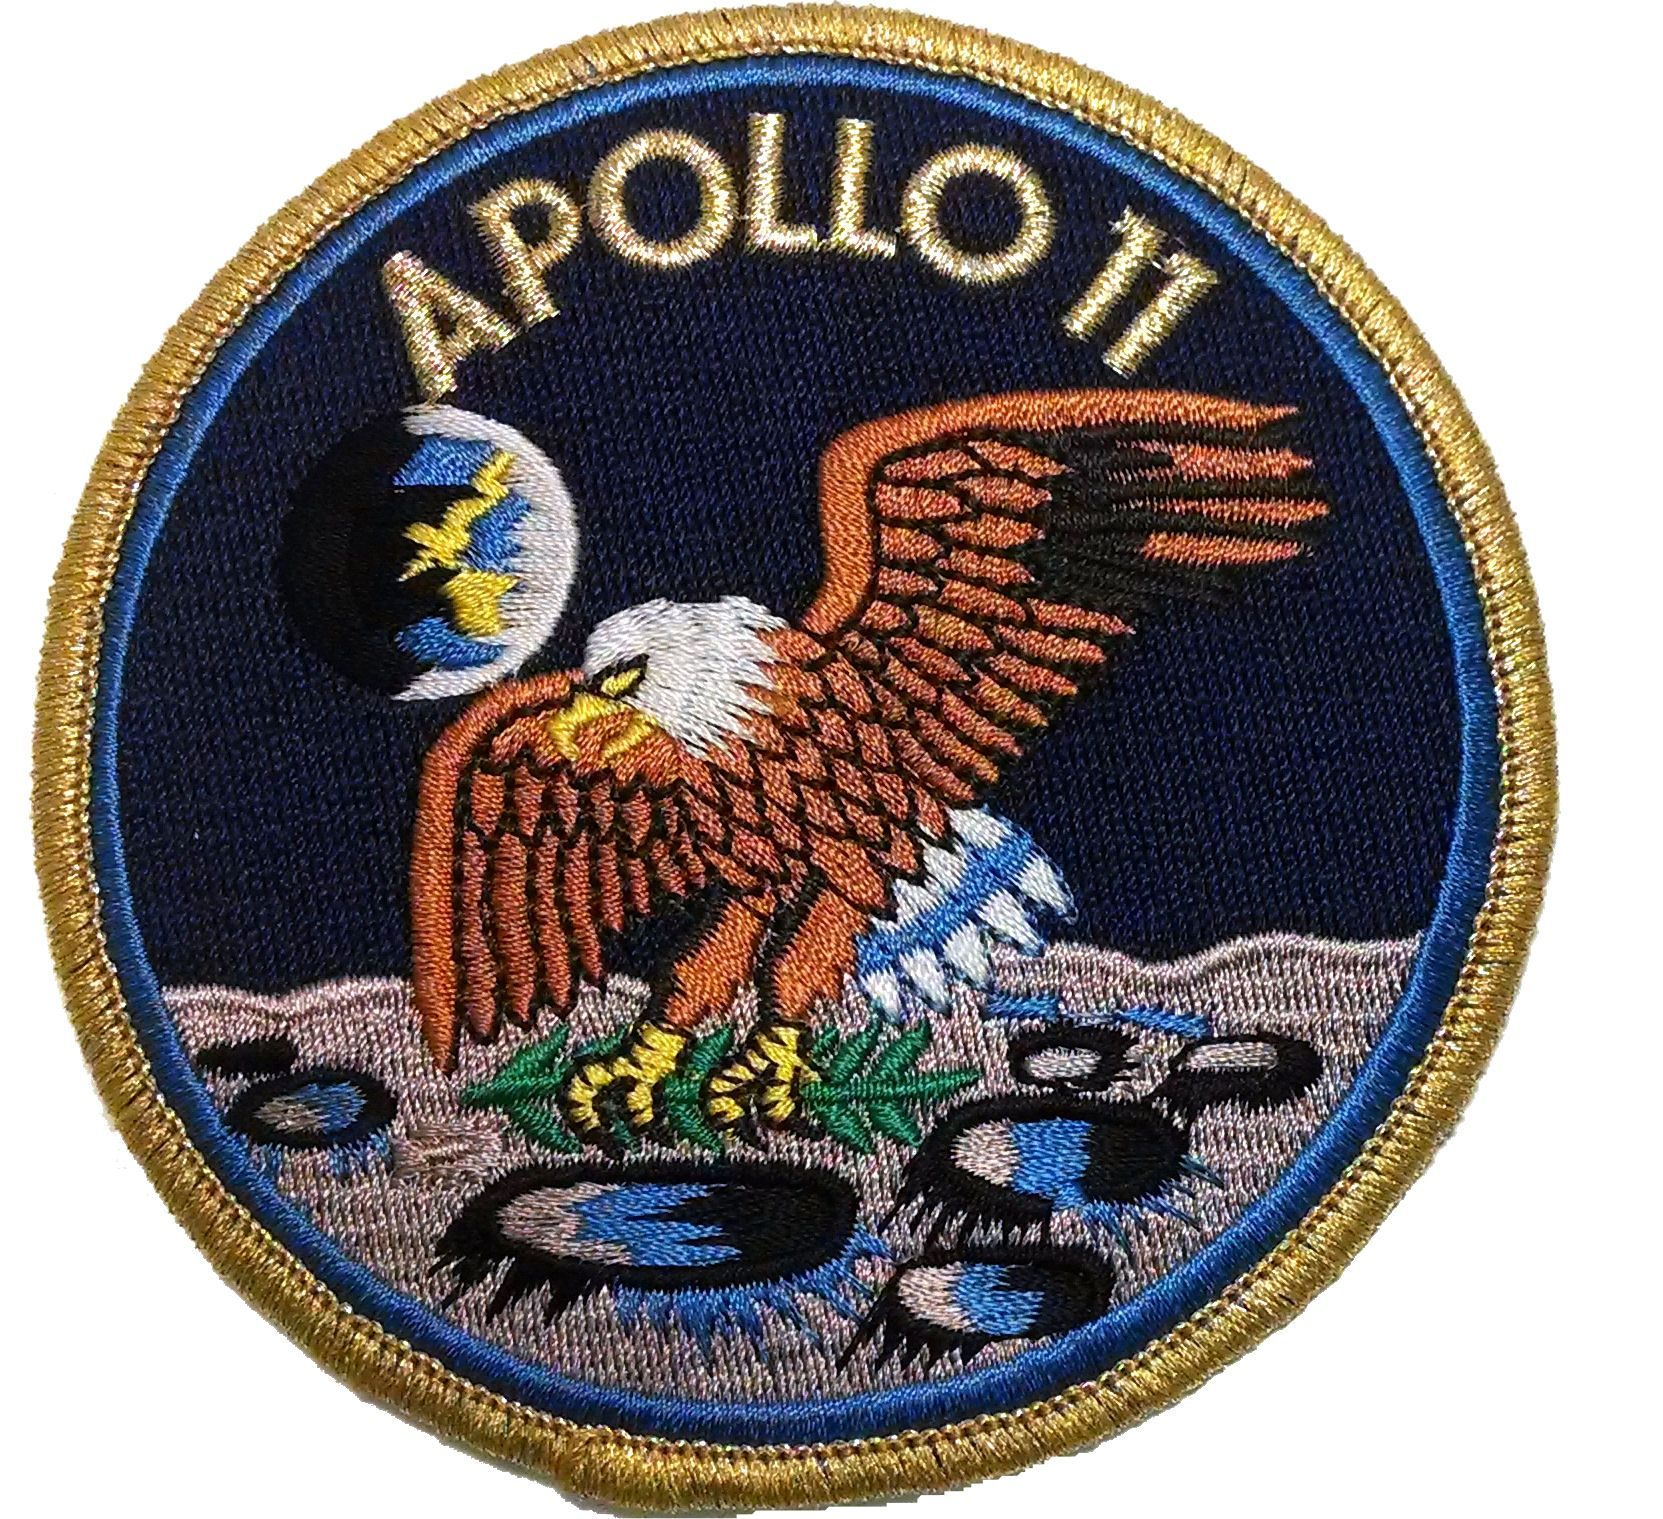 apollo space badges - photo #15